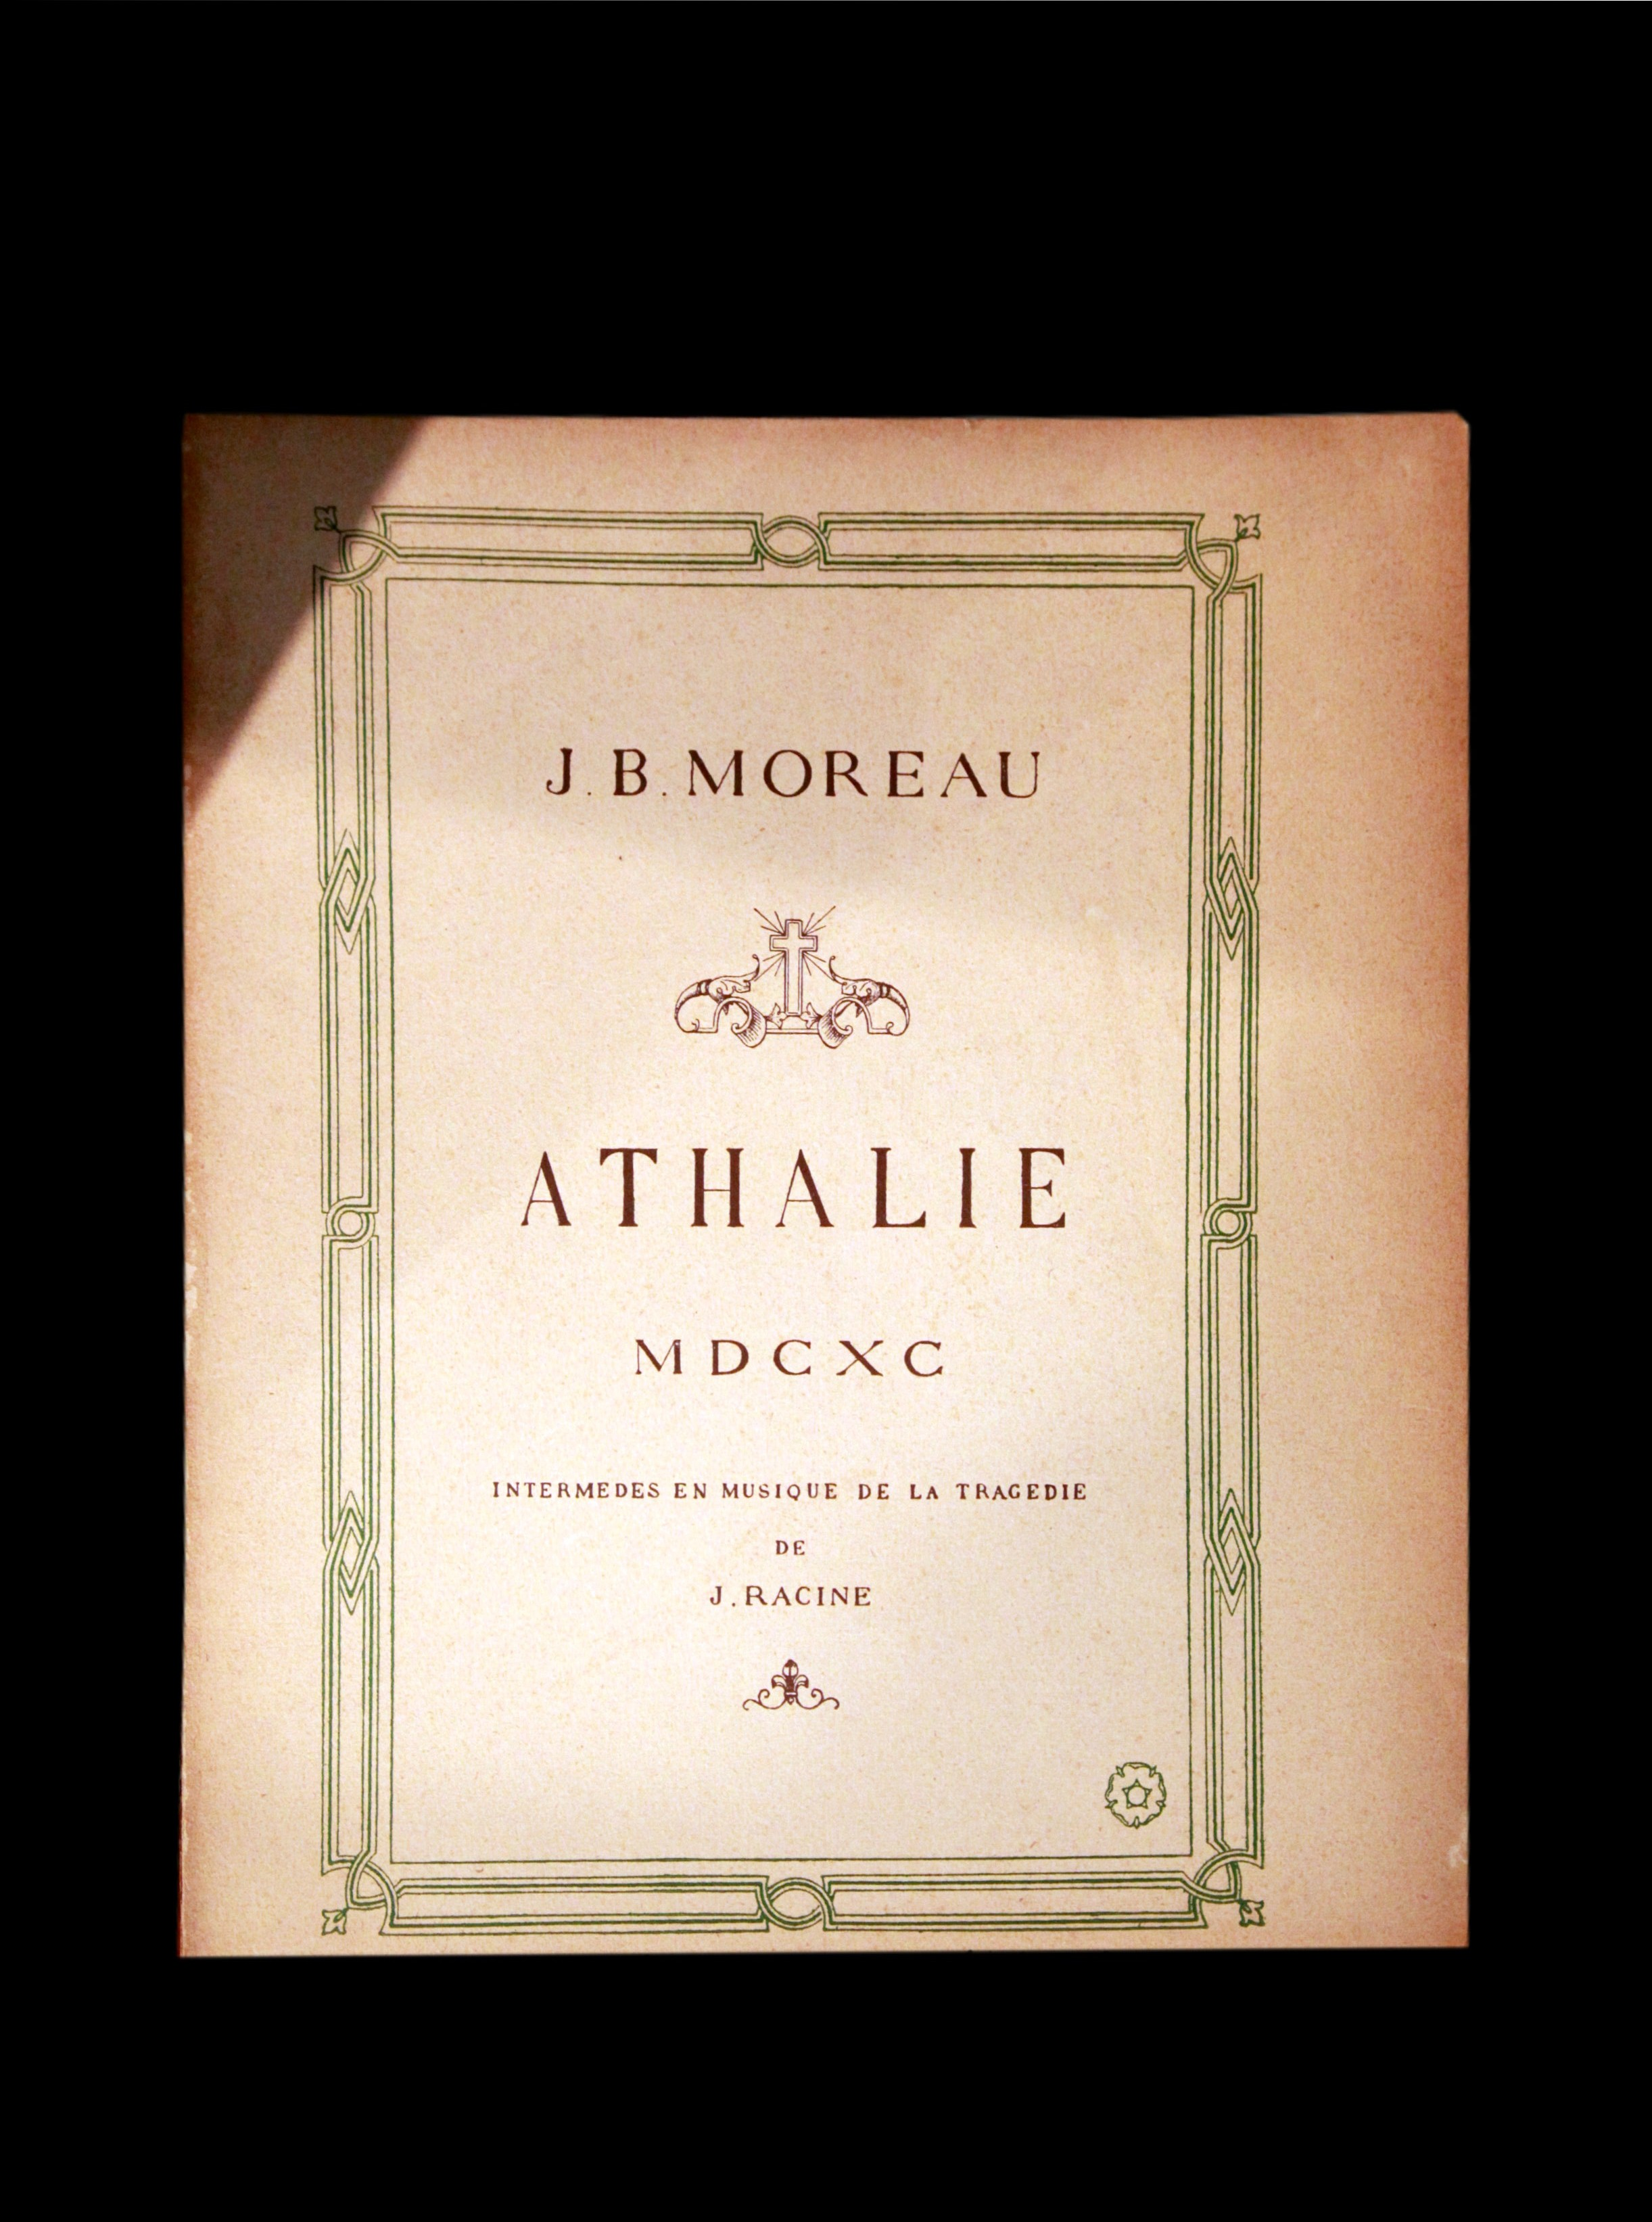 063.Moreau_Athalie.jpg